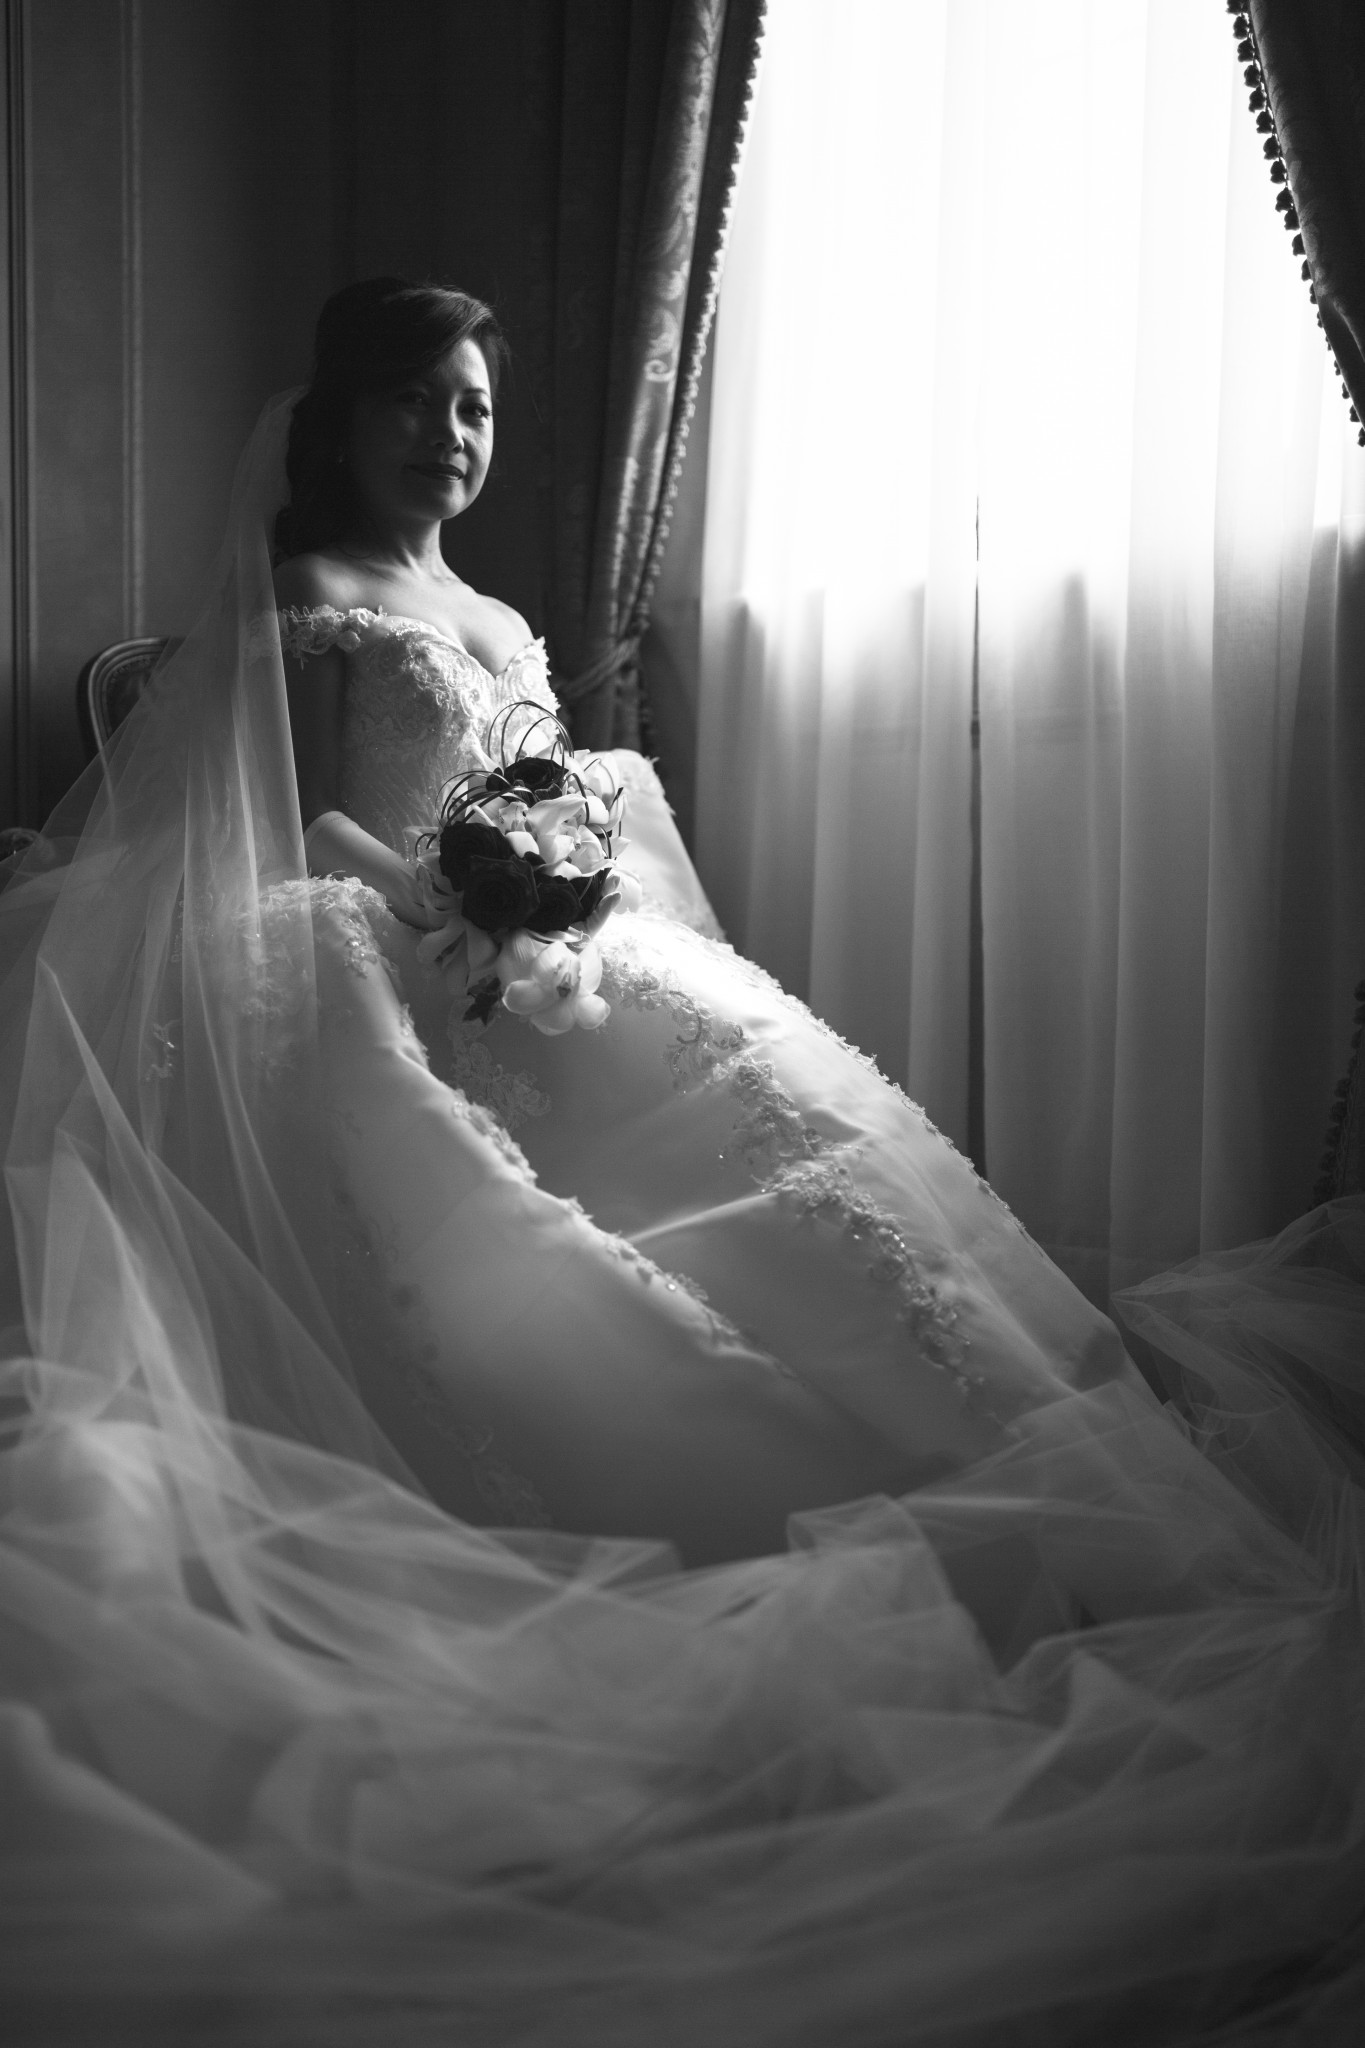 foto a castelbrando di matrimonio